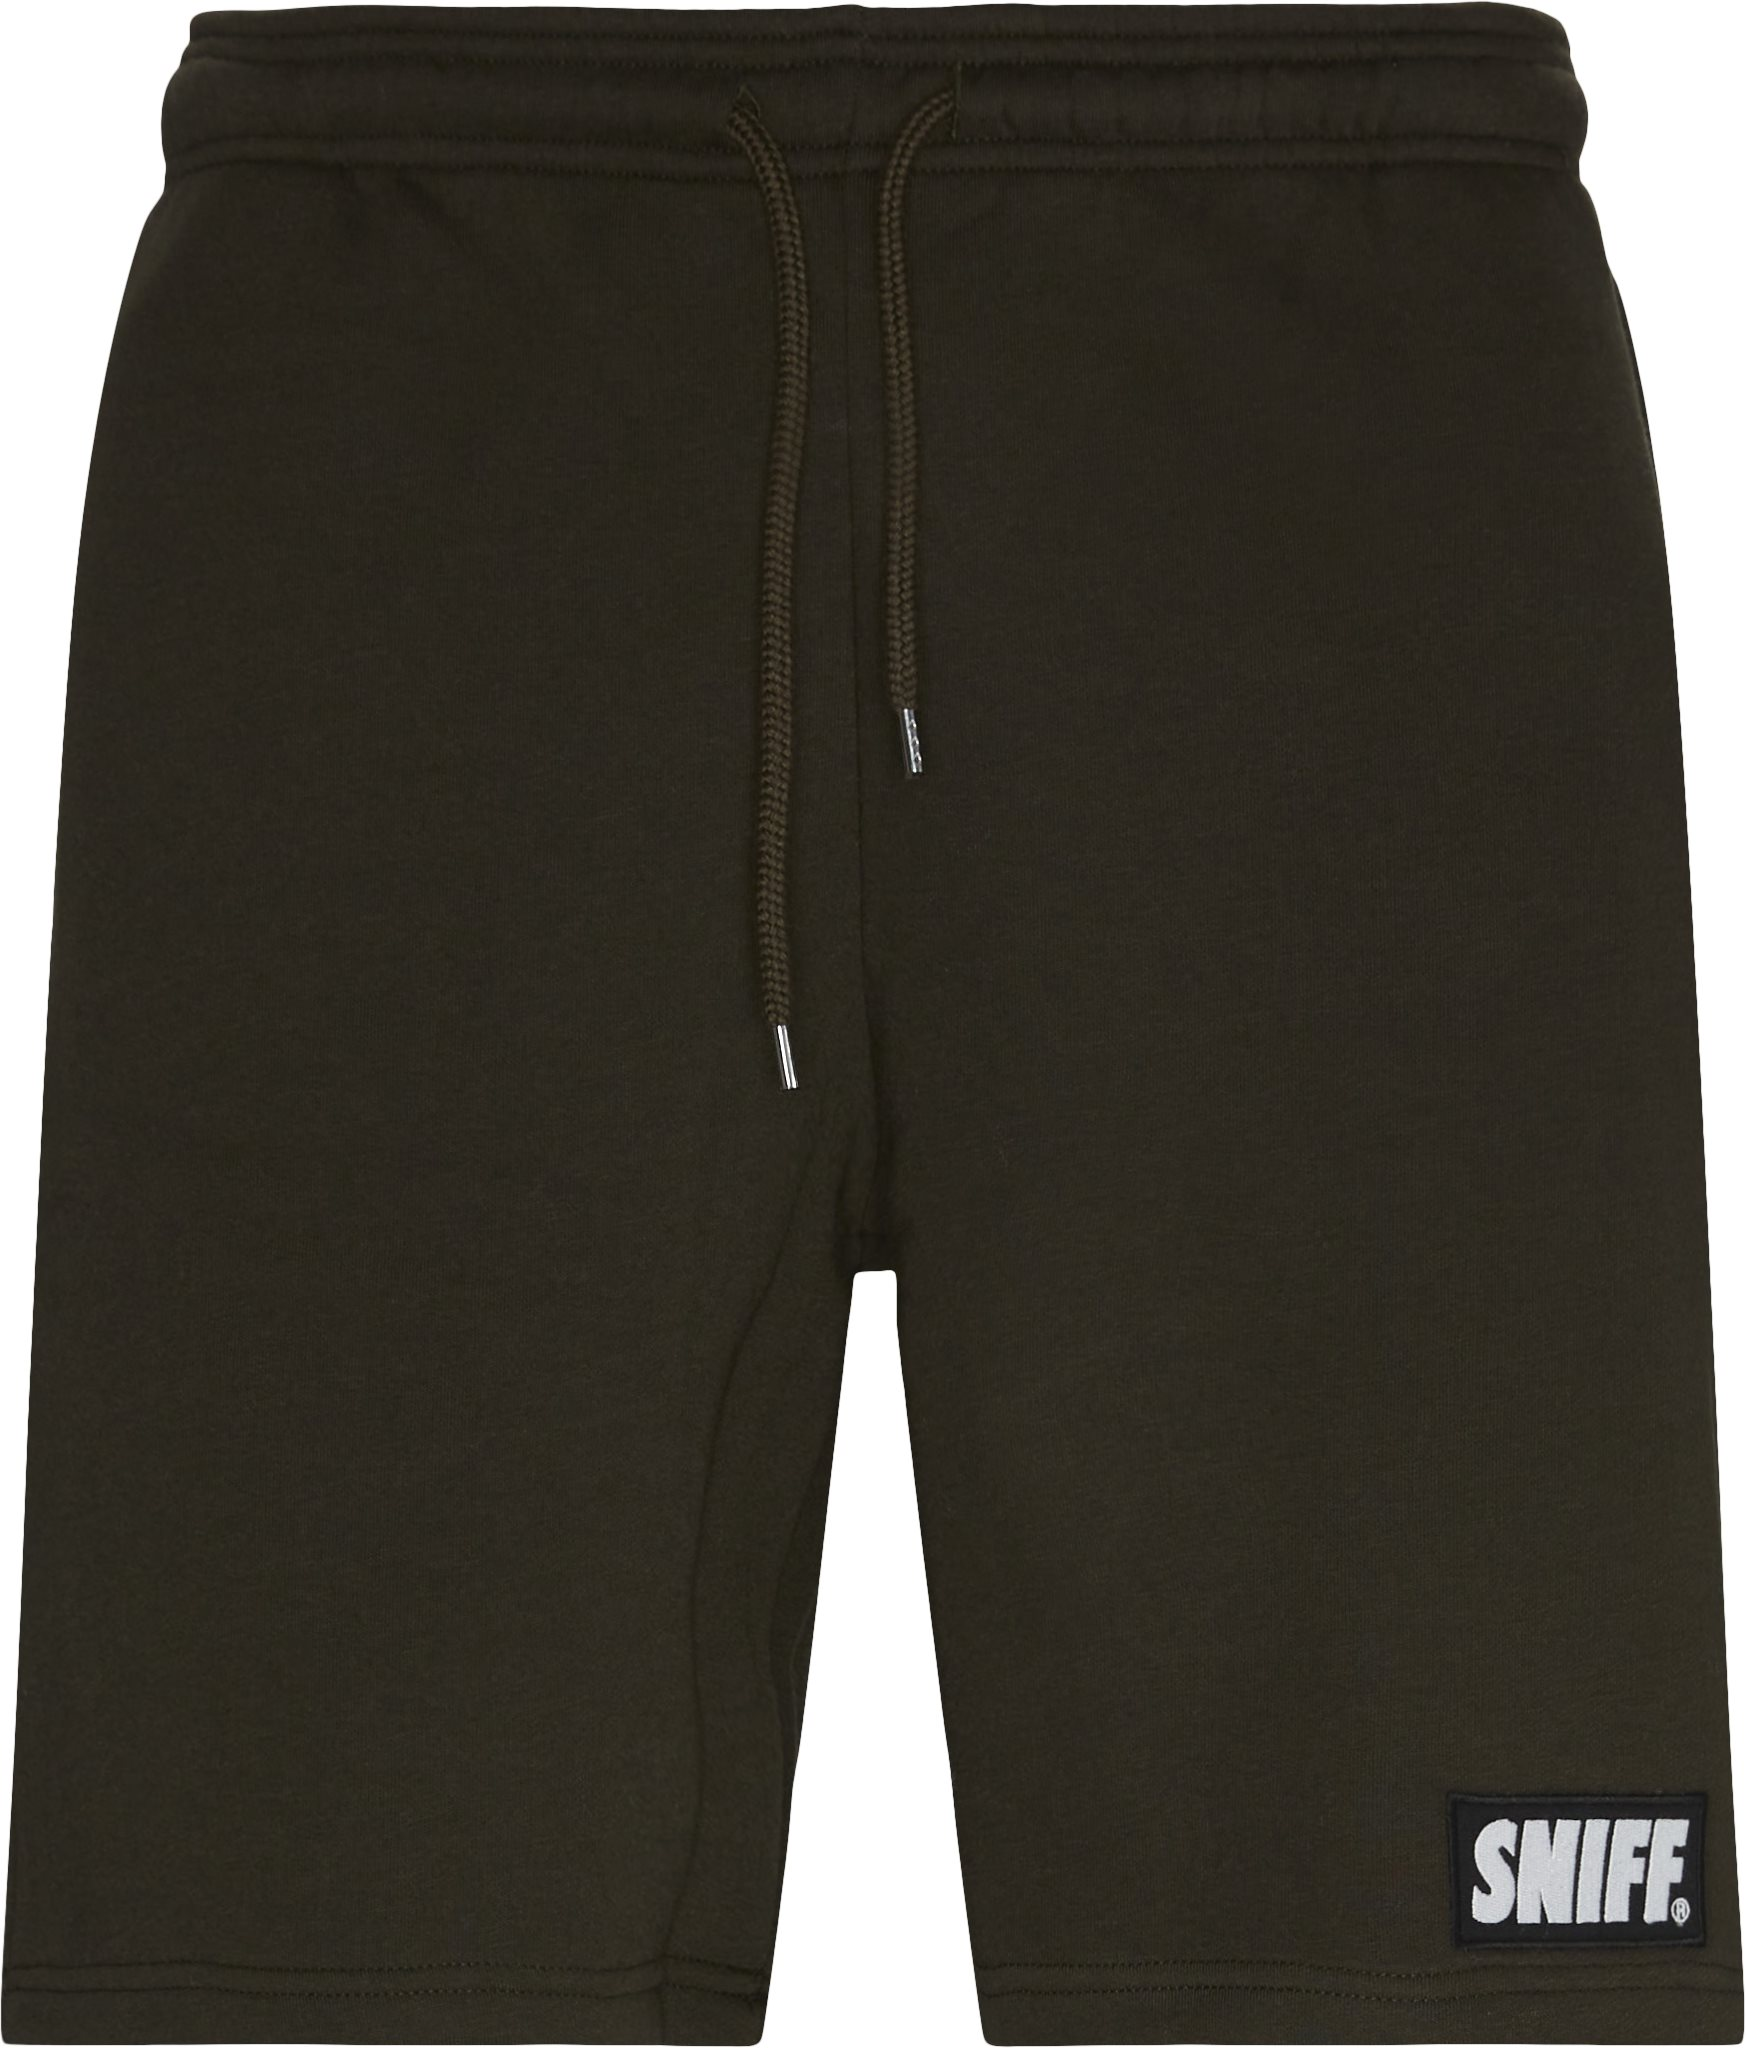 Shorts - Regular fit - Armé